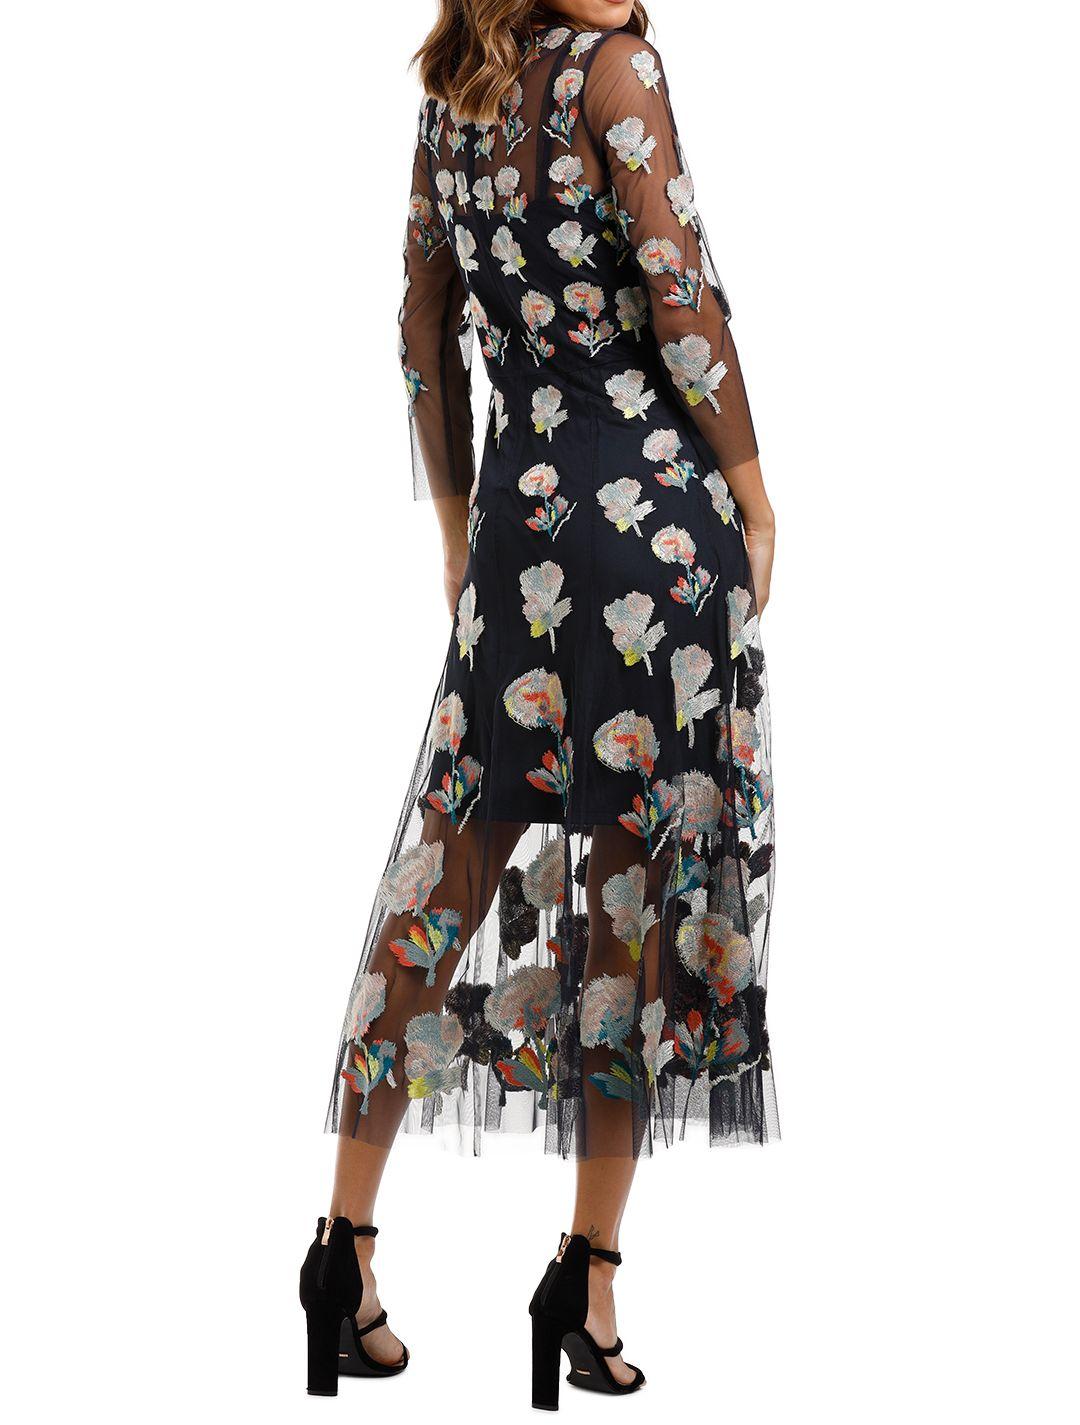 Moss and Spy Monet Dress Navy Multi Florals midi sheer